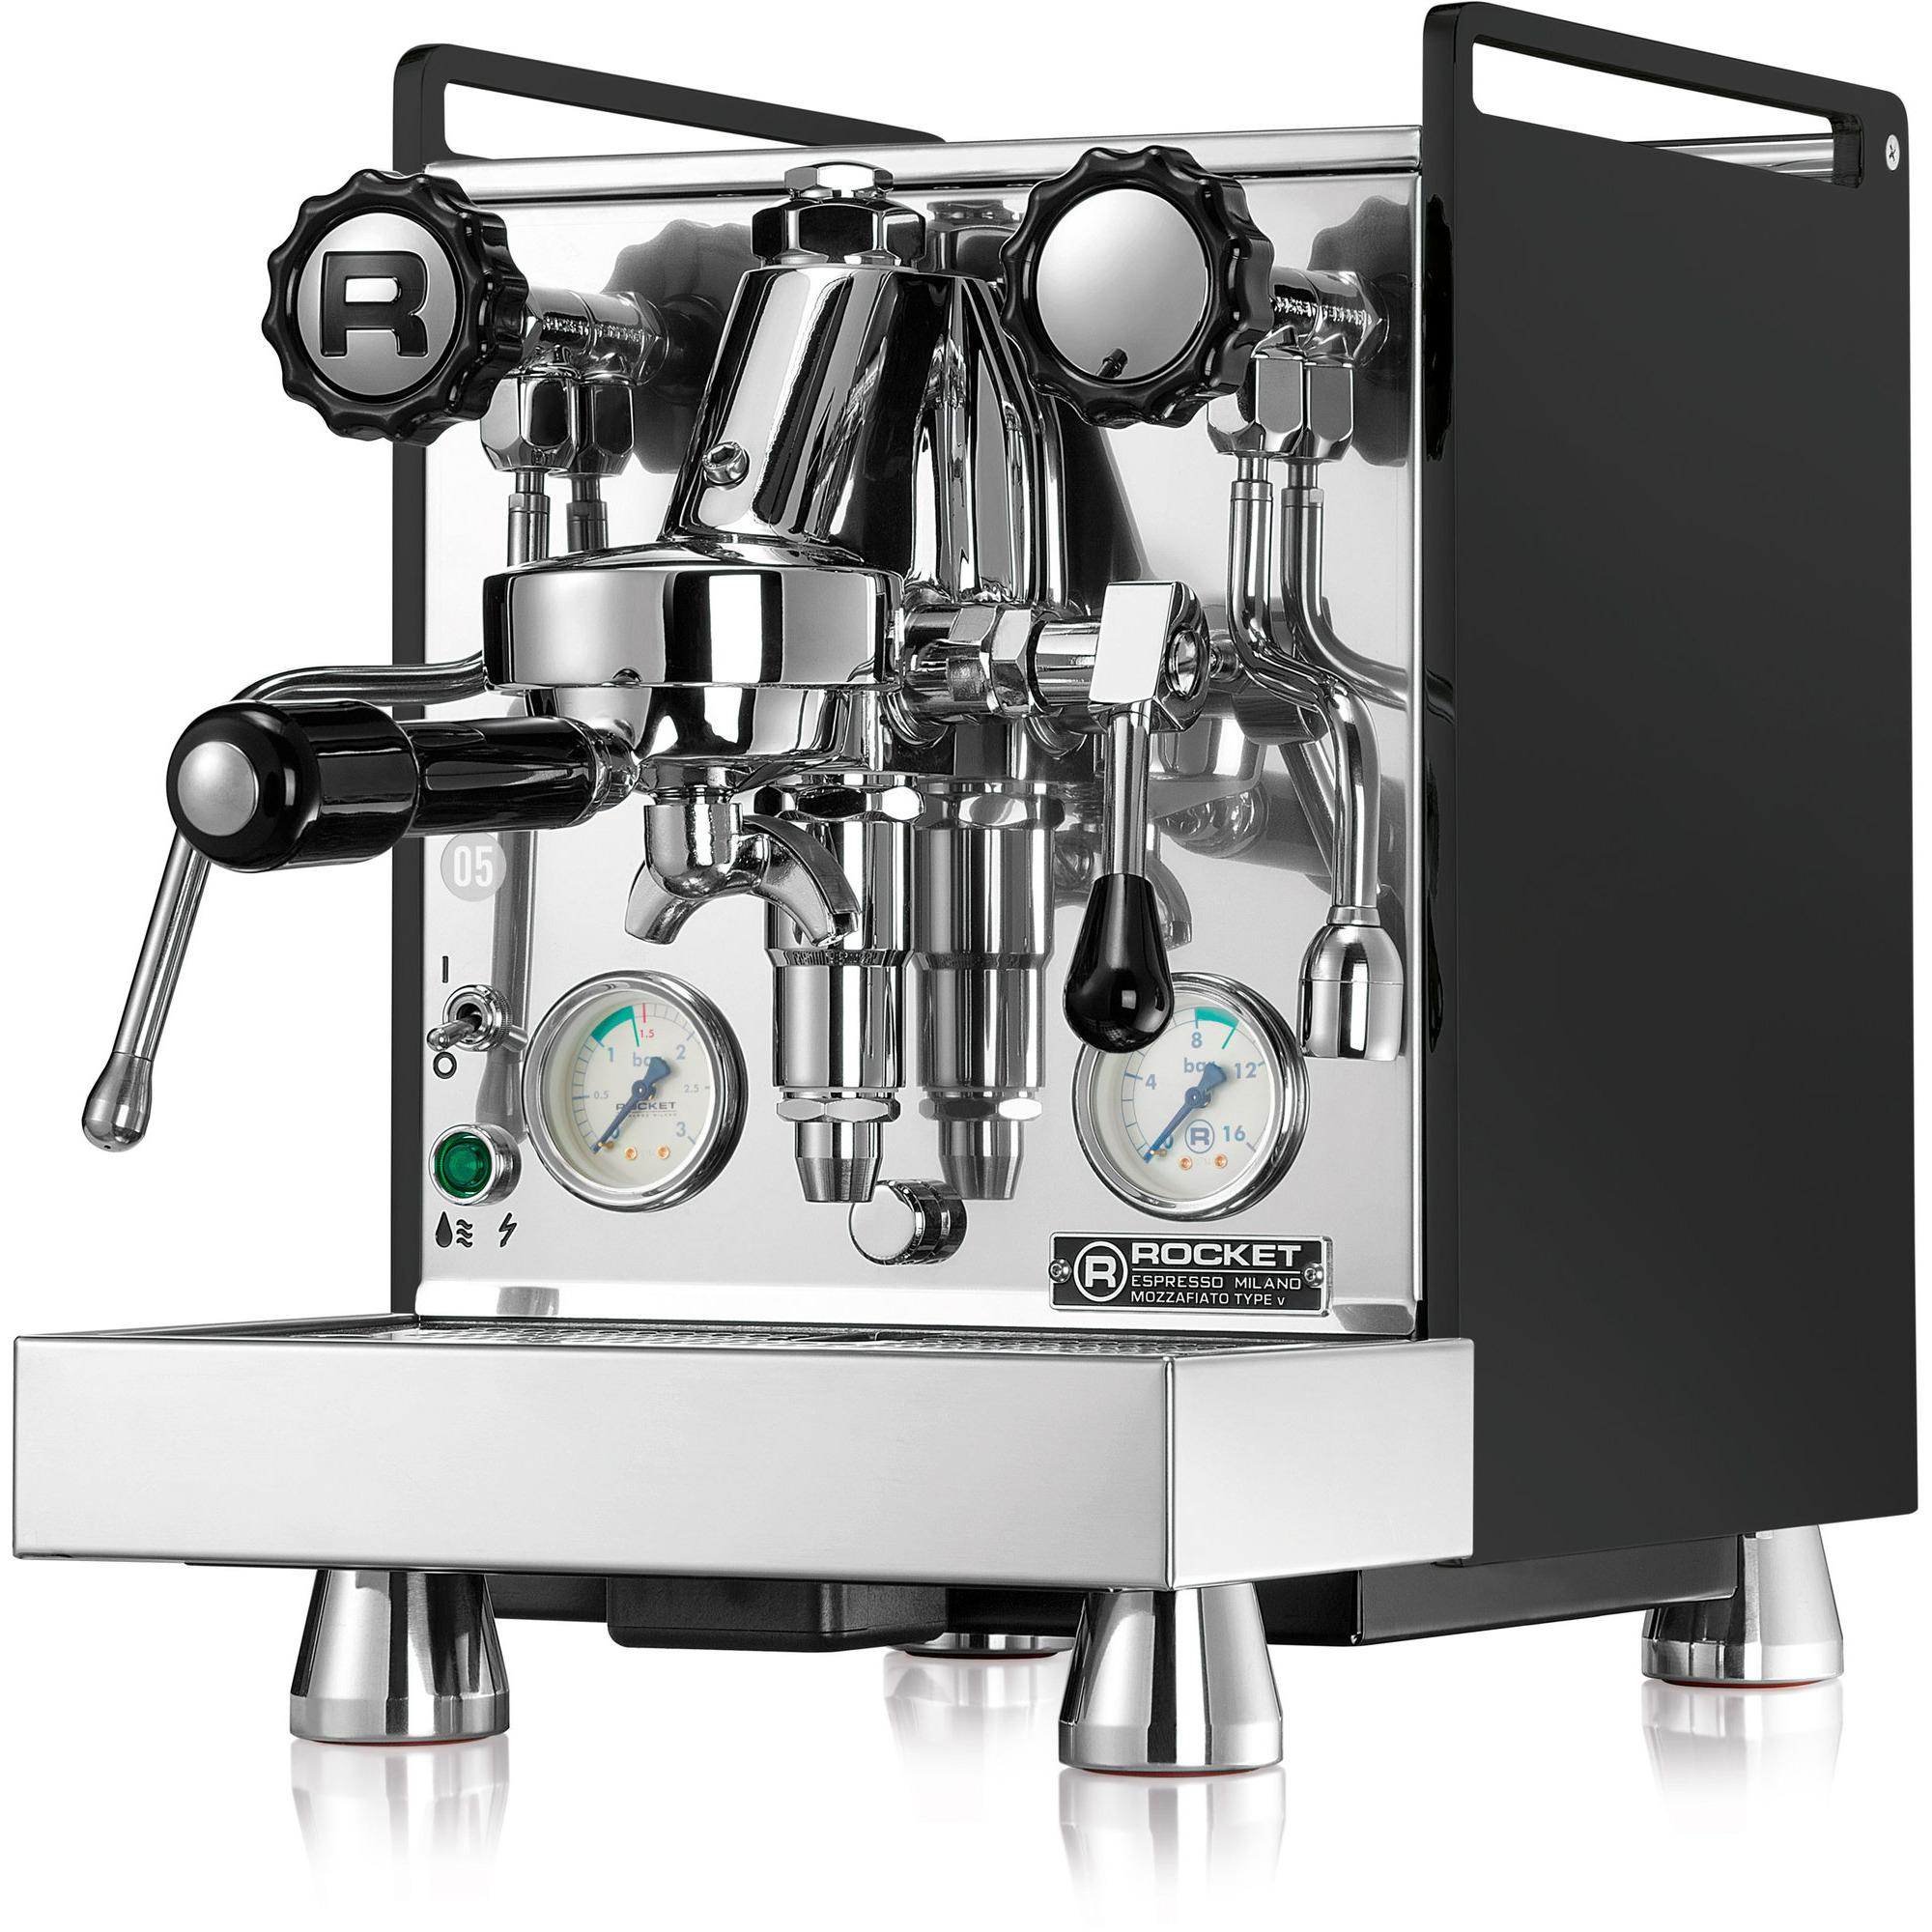 Rocket Mozzafiato Cronometro V Espressomaskin Svart